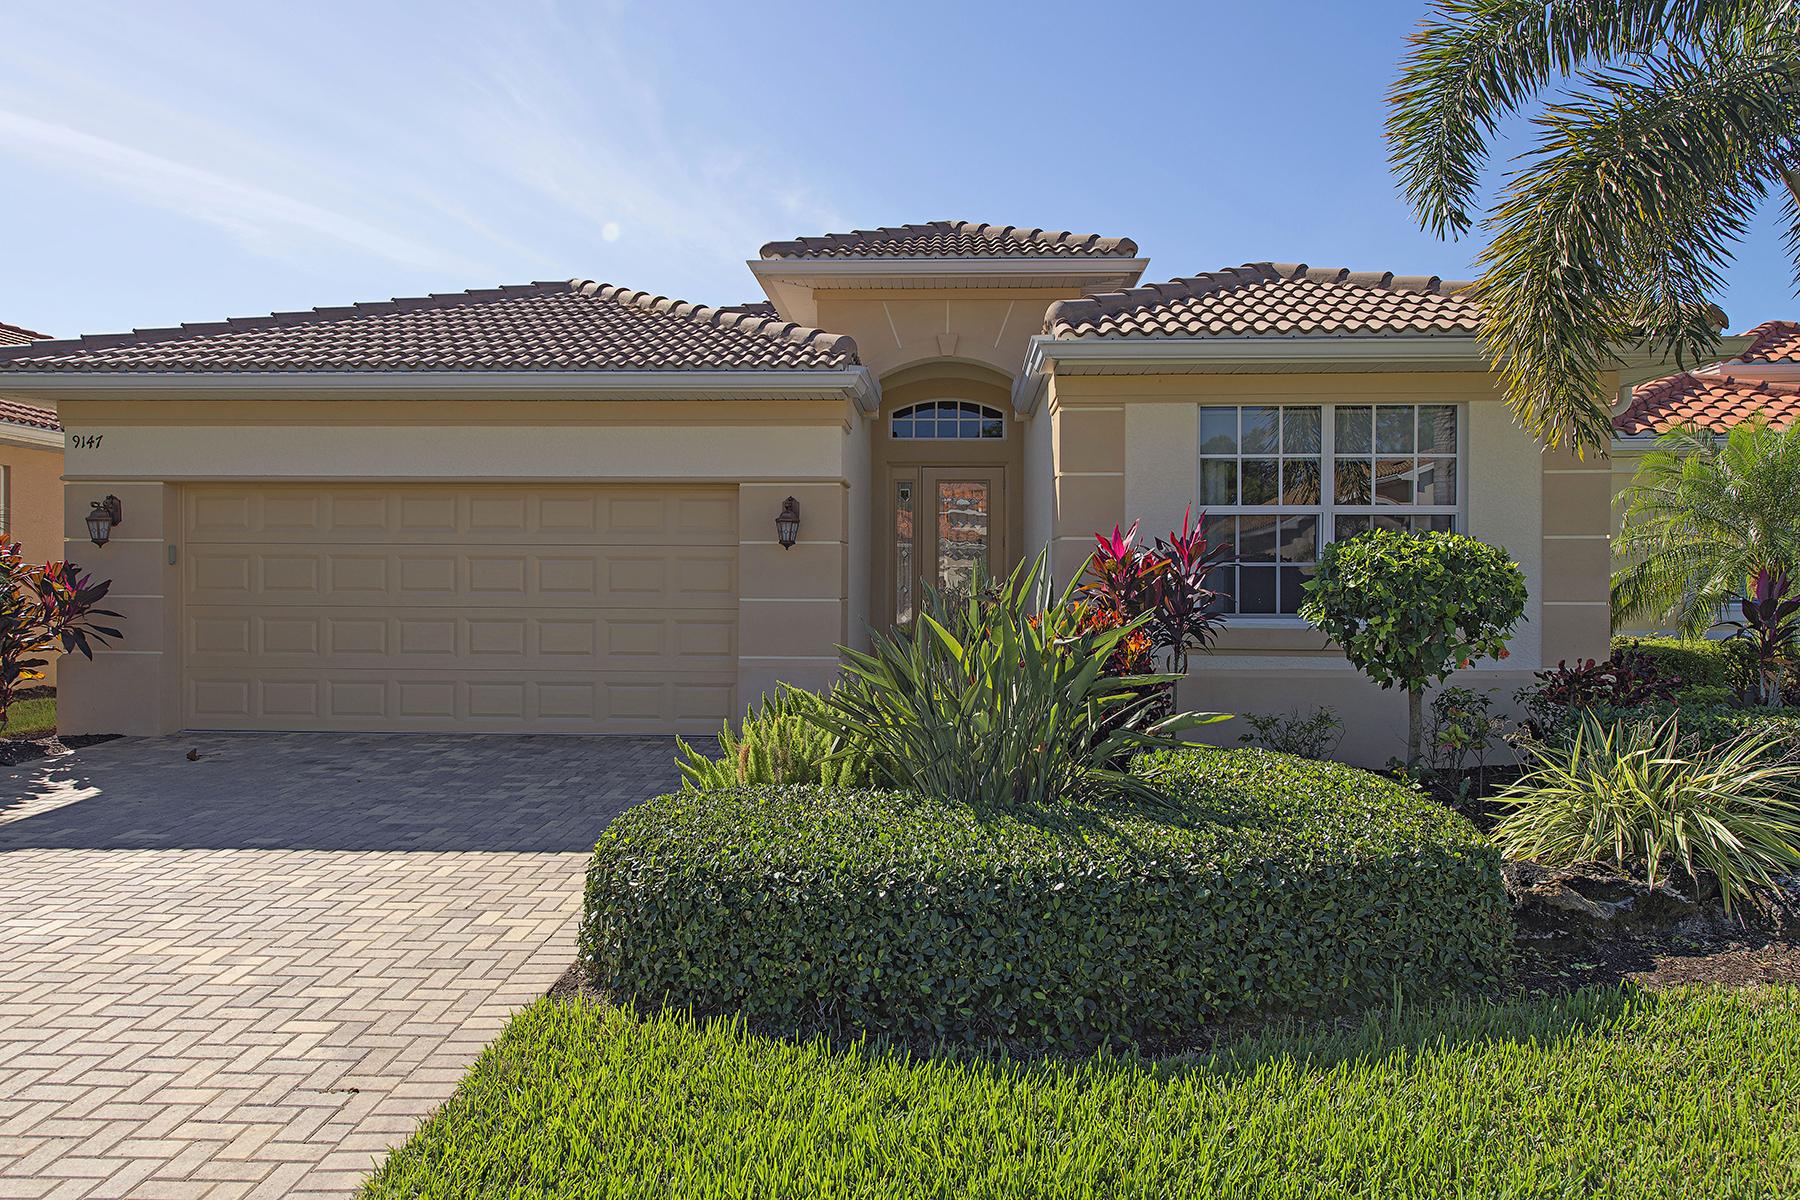 Single Family Home for Sale at THE RESERVE AT ESTERO 9147 Astonia Way Estero, Florida, 33967 United States